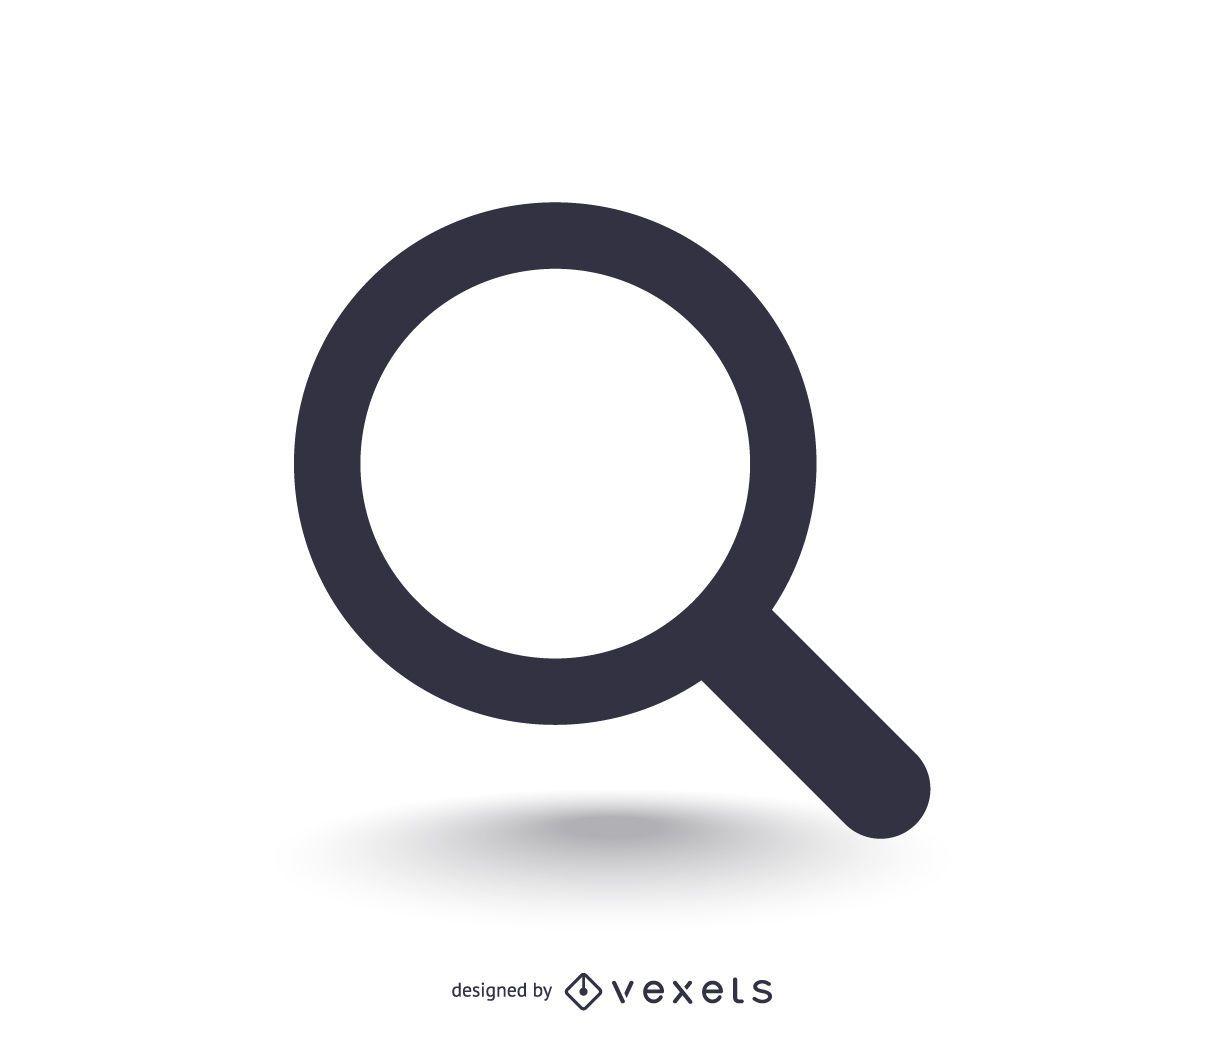 Basic search icon